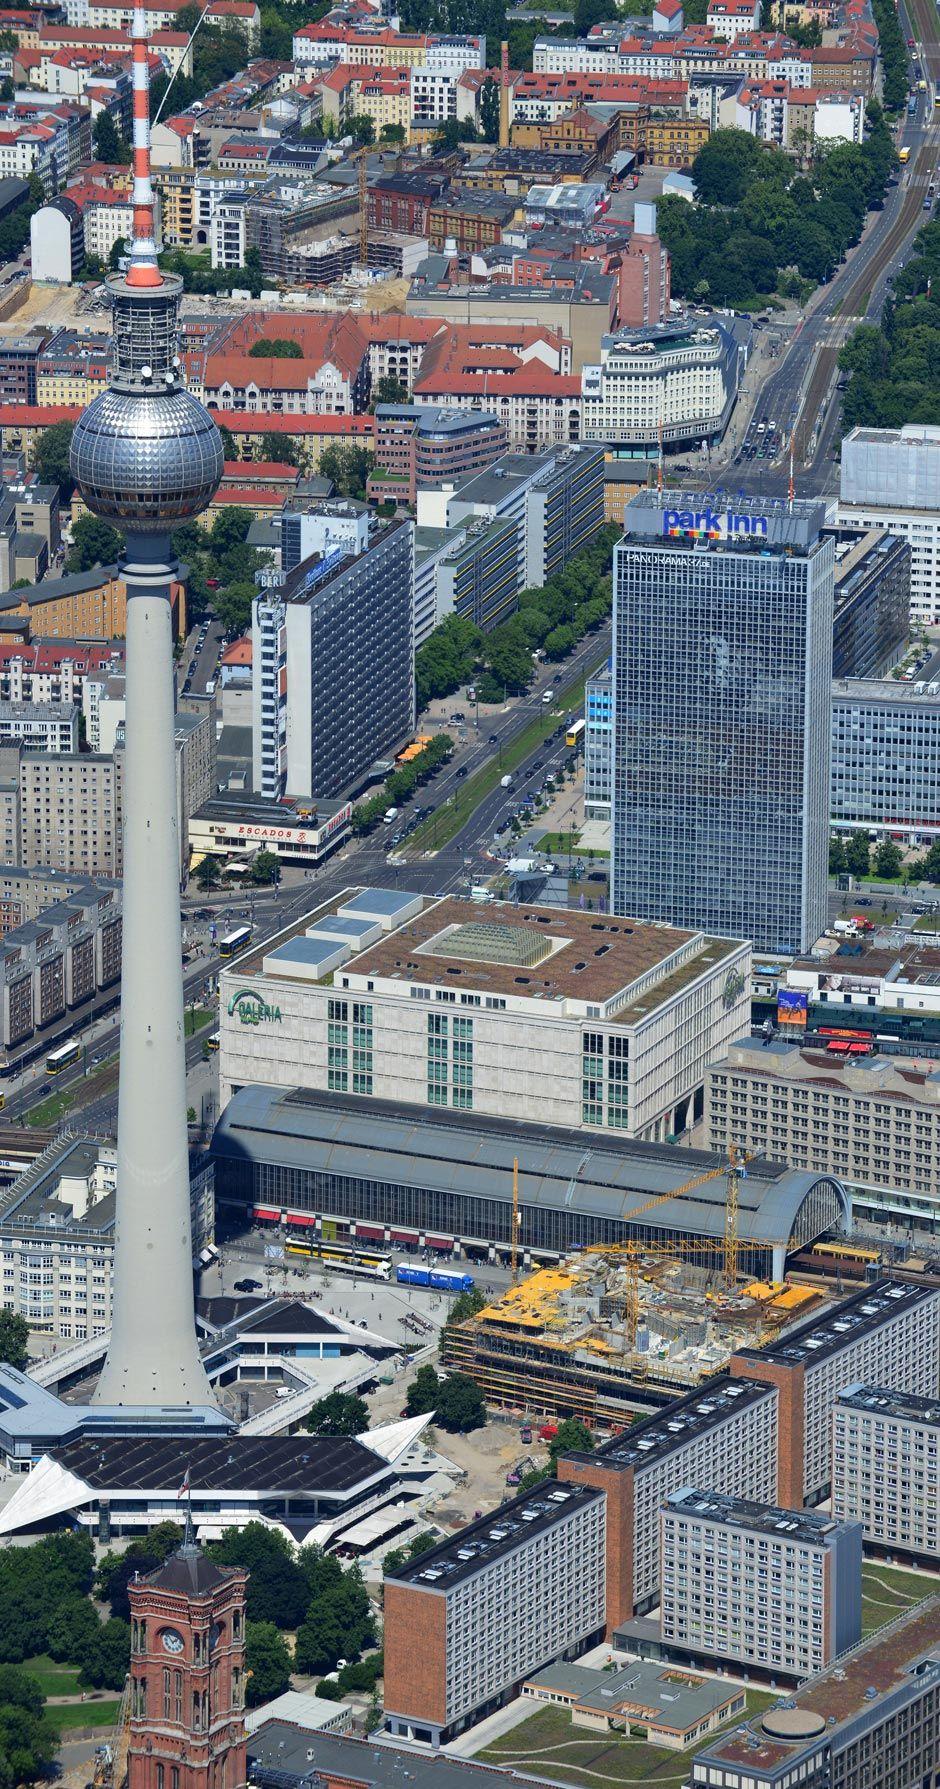 Das Ist Berlin Von Oben Berlin Berlin Von Oben Berlin Aktuell